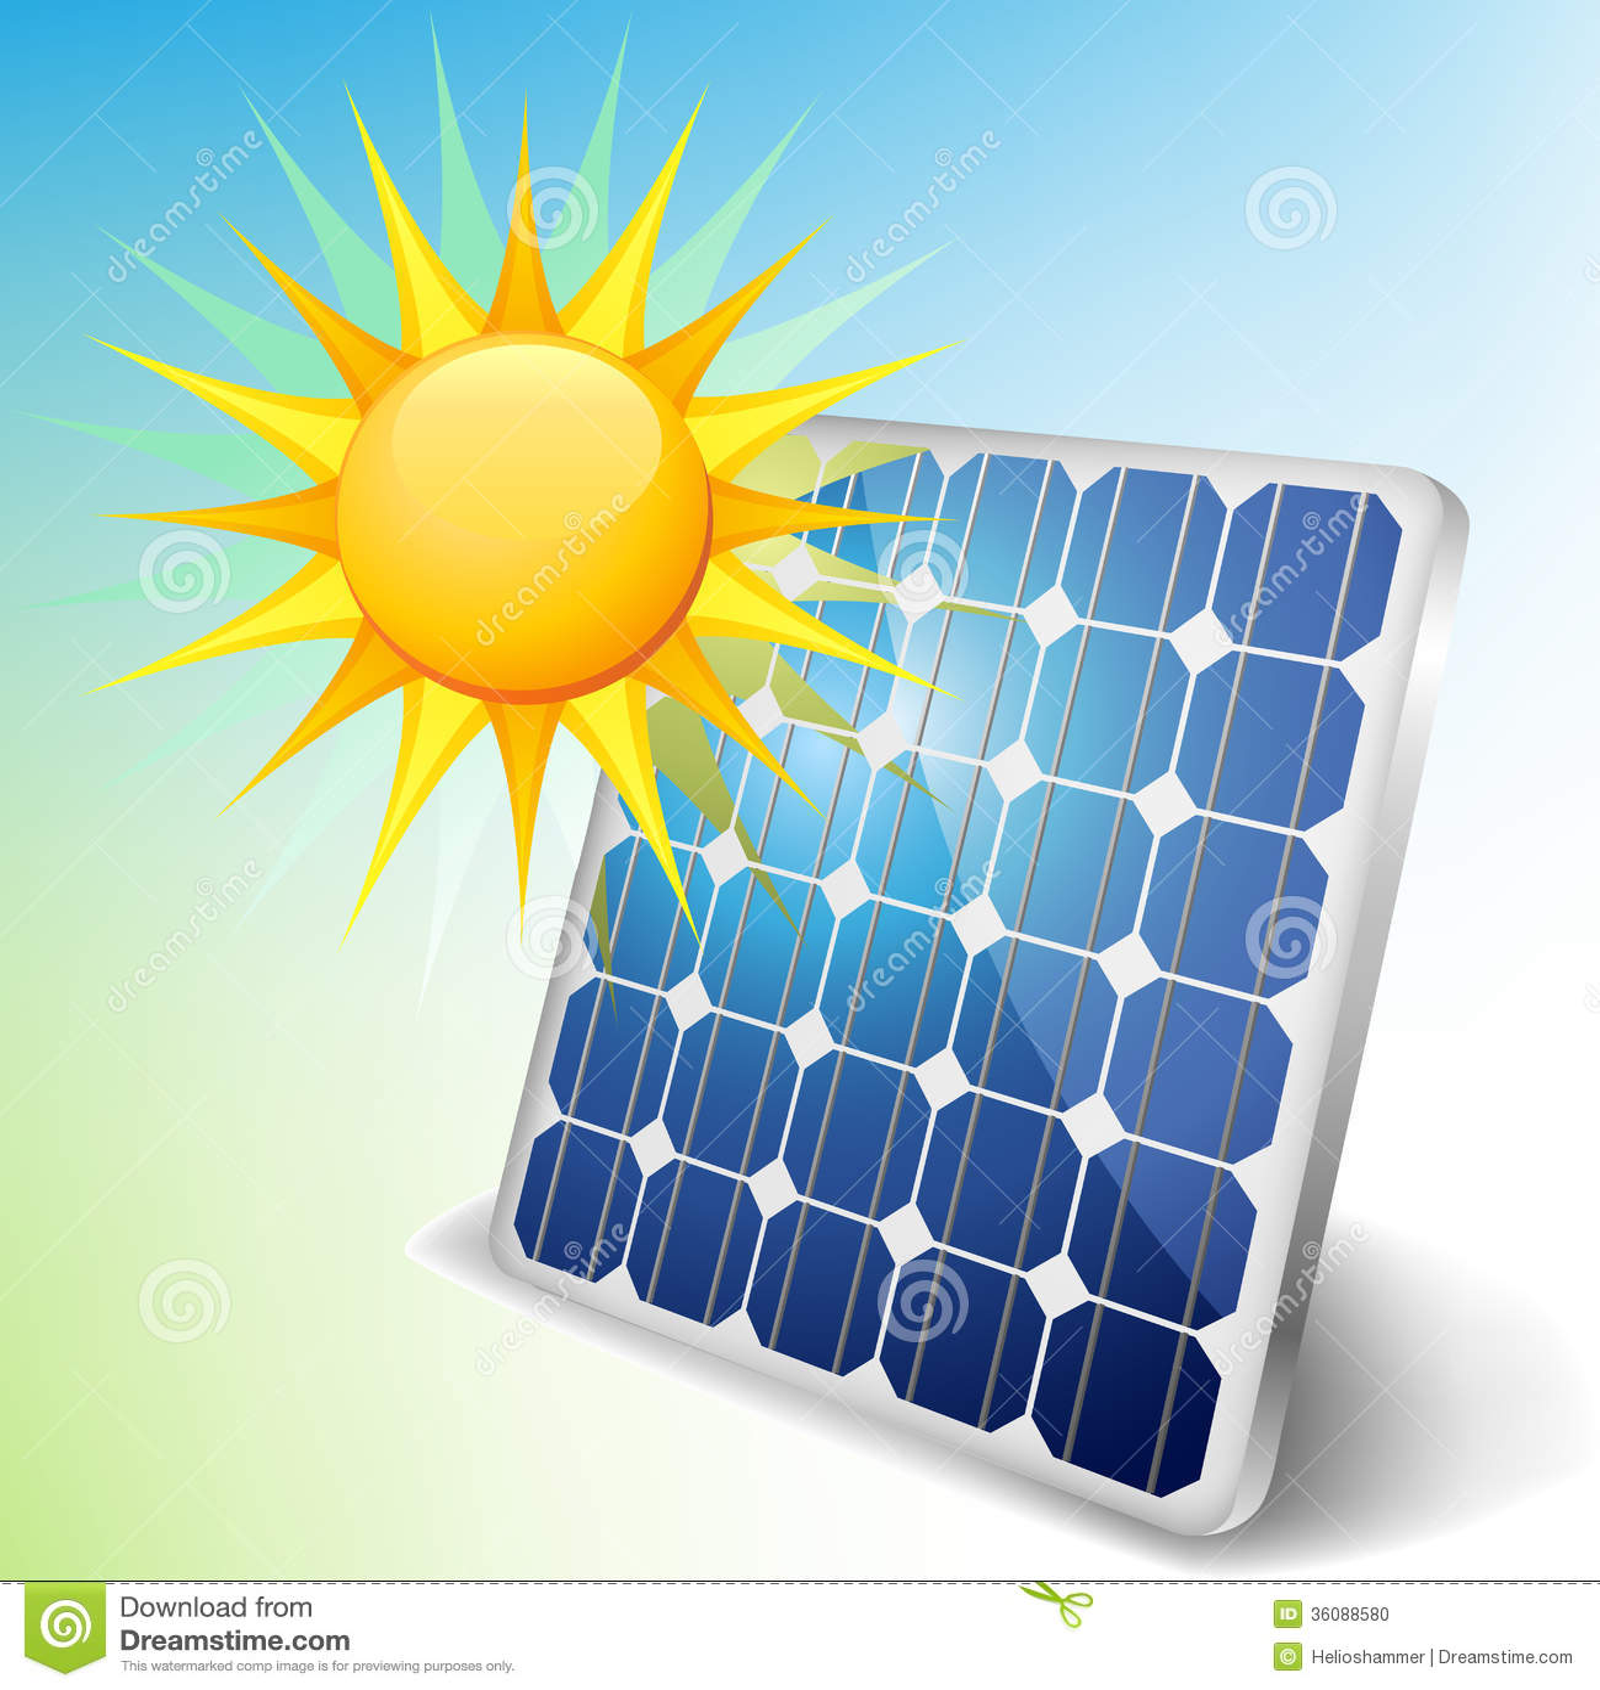 Solar Panel With Sun Stock Photo - Image: 36088580